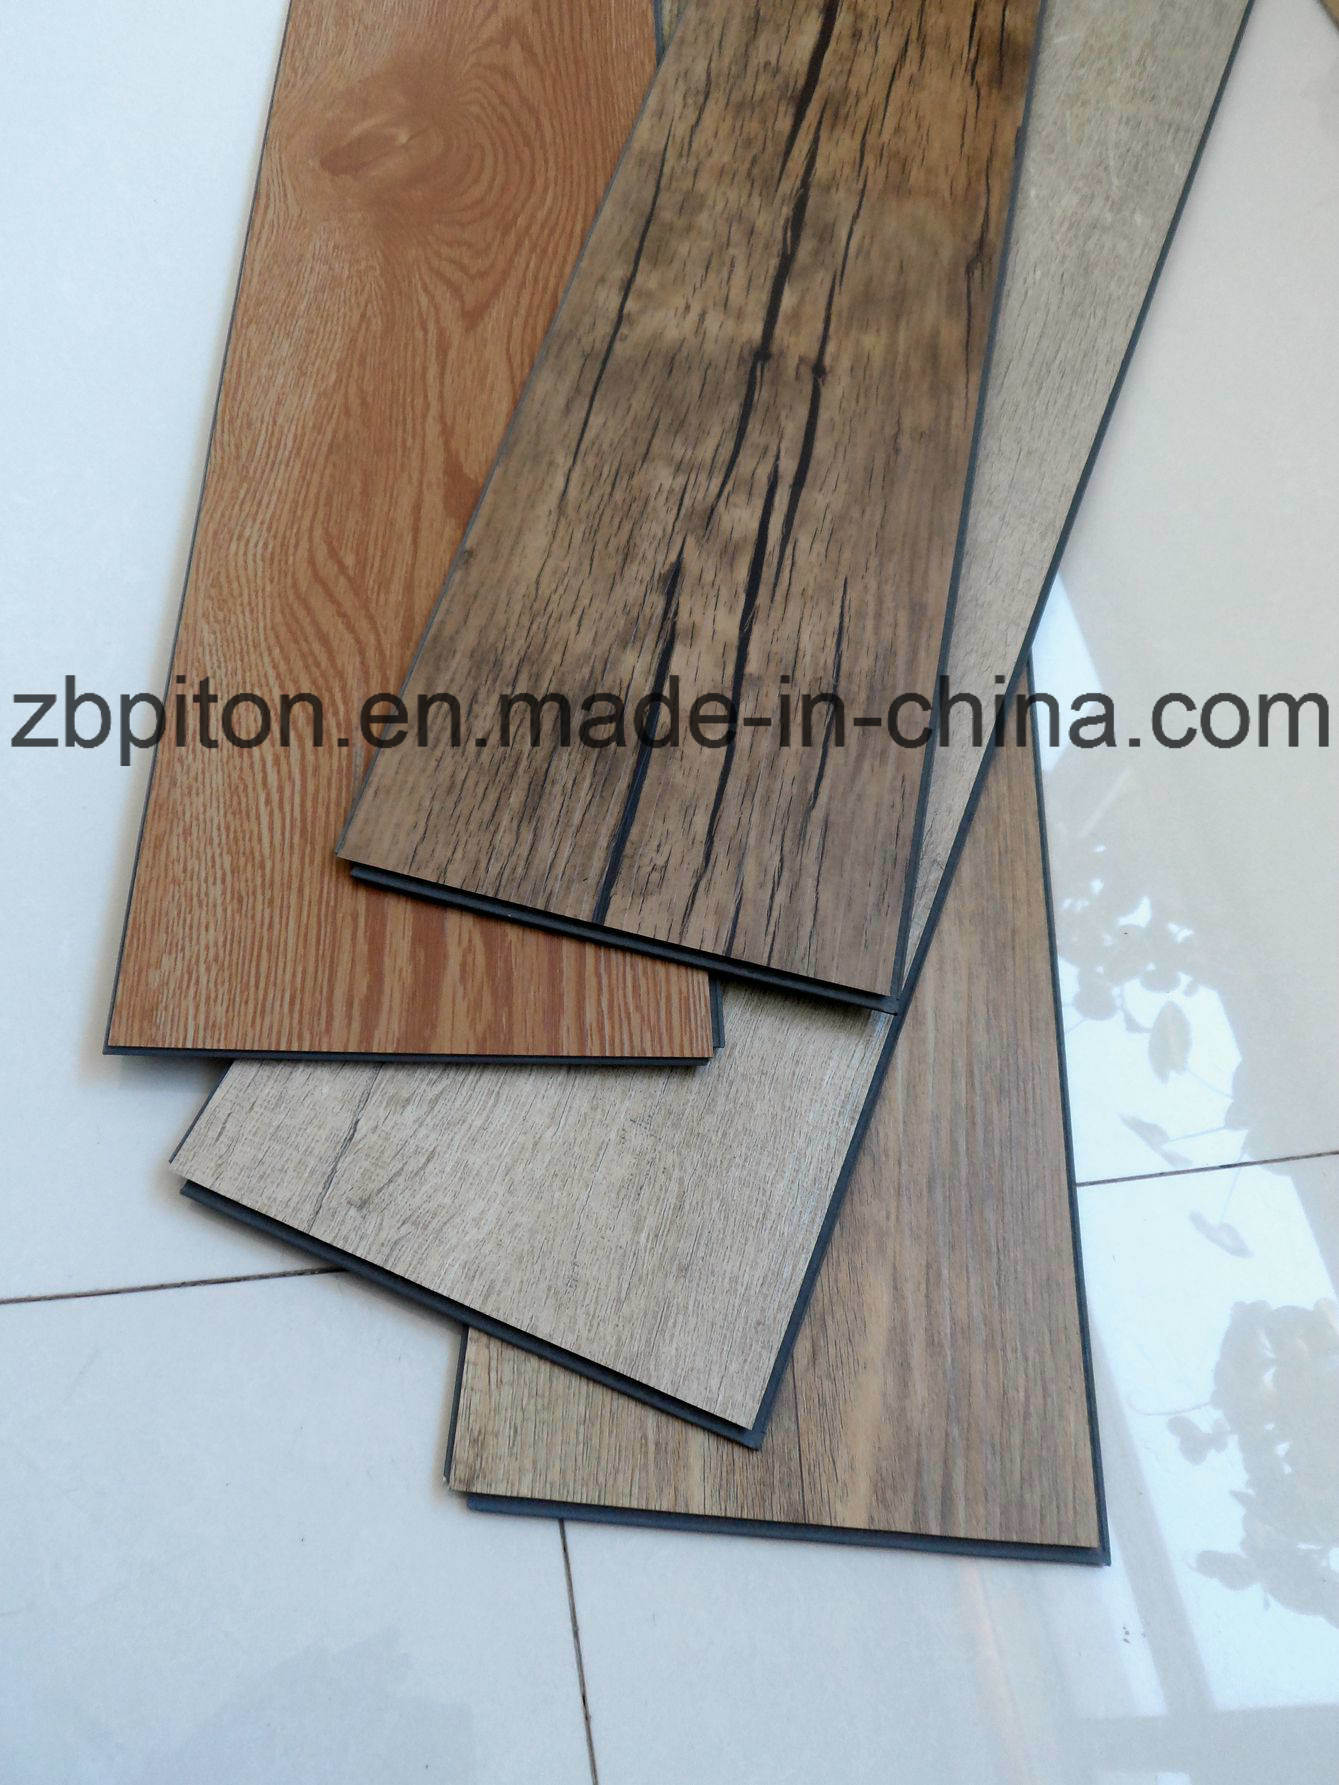 Interlocking tile flooring images home flooring design interlocking vinyl floor tiles gallery tile flooring design ideas click together tile flooring 100 images how dailygadgetfo Choice Image